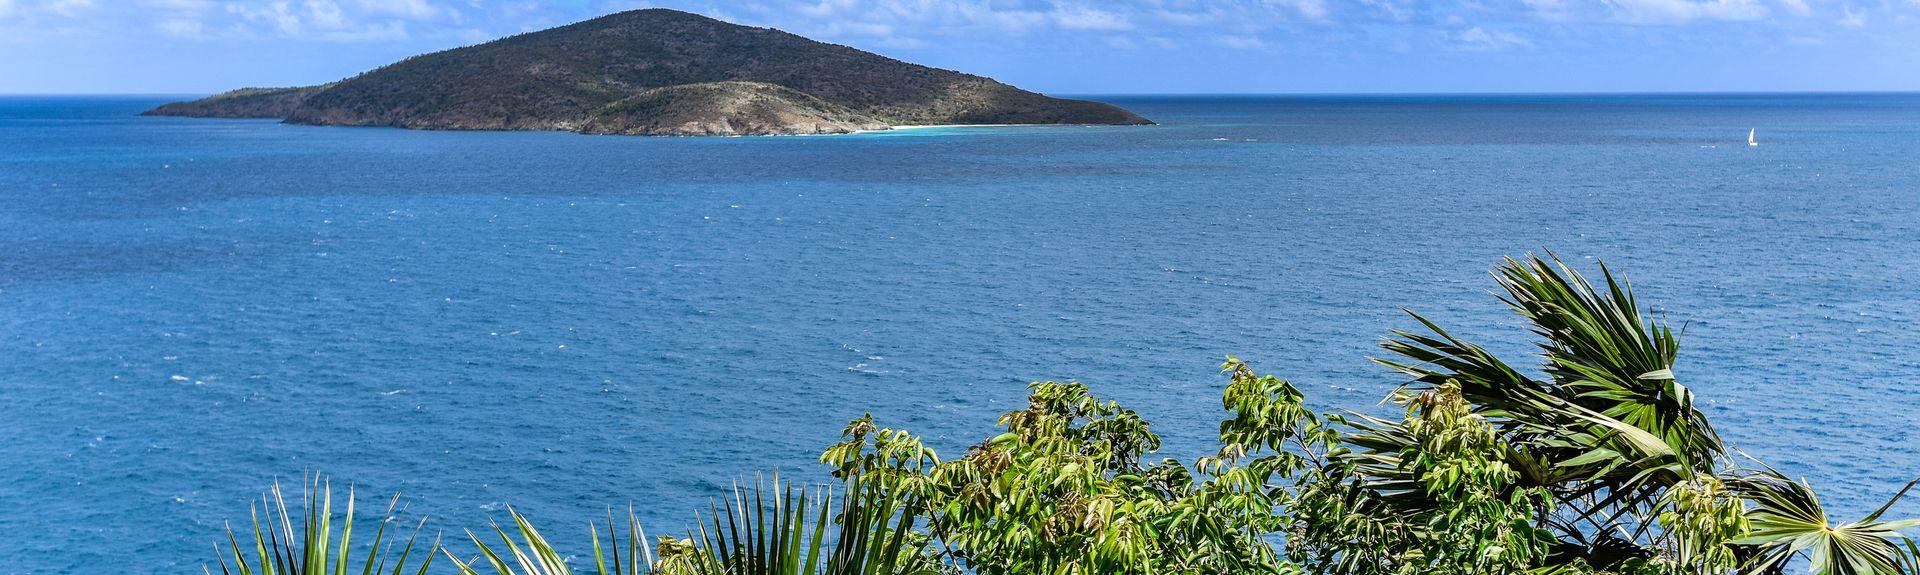 Rosendal, St Thomas, US Virgin Islands